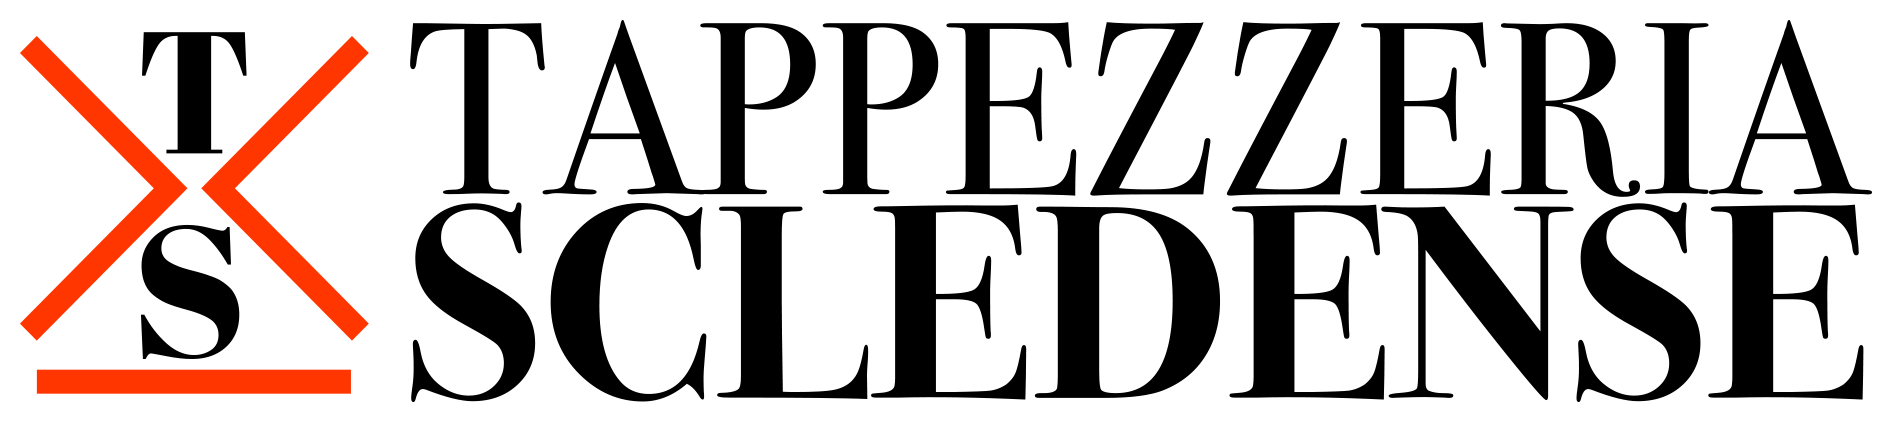 Tappezzeria Scledense